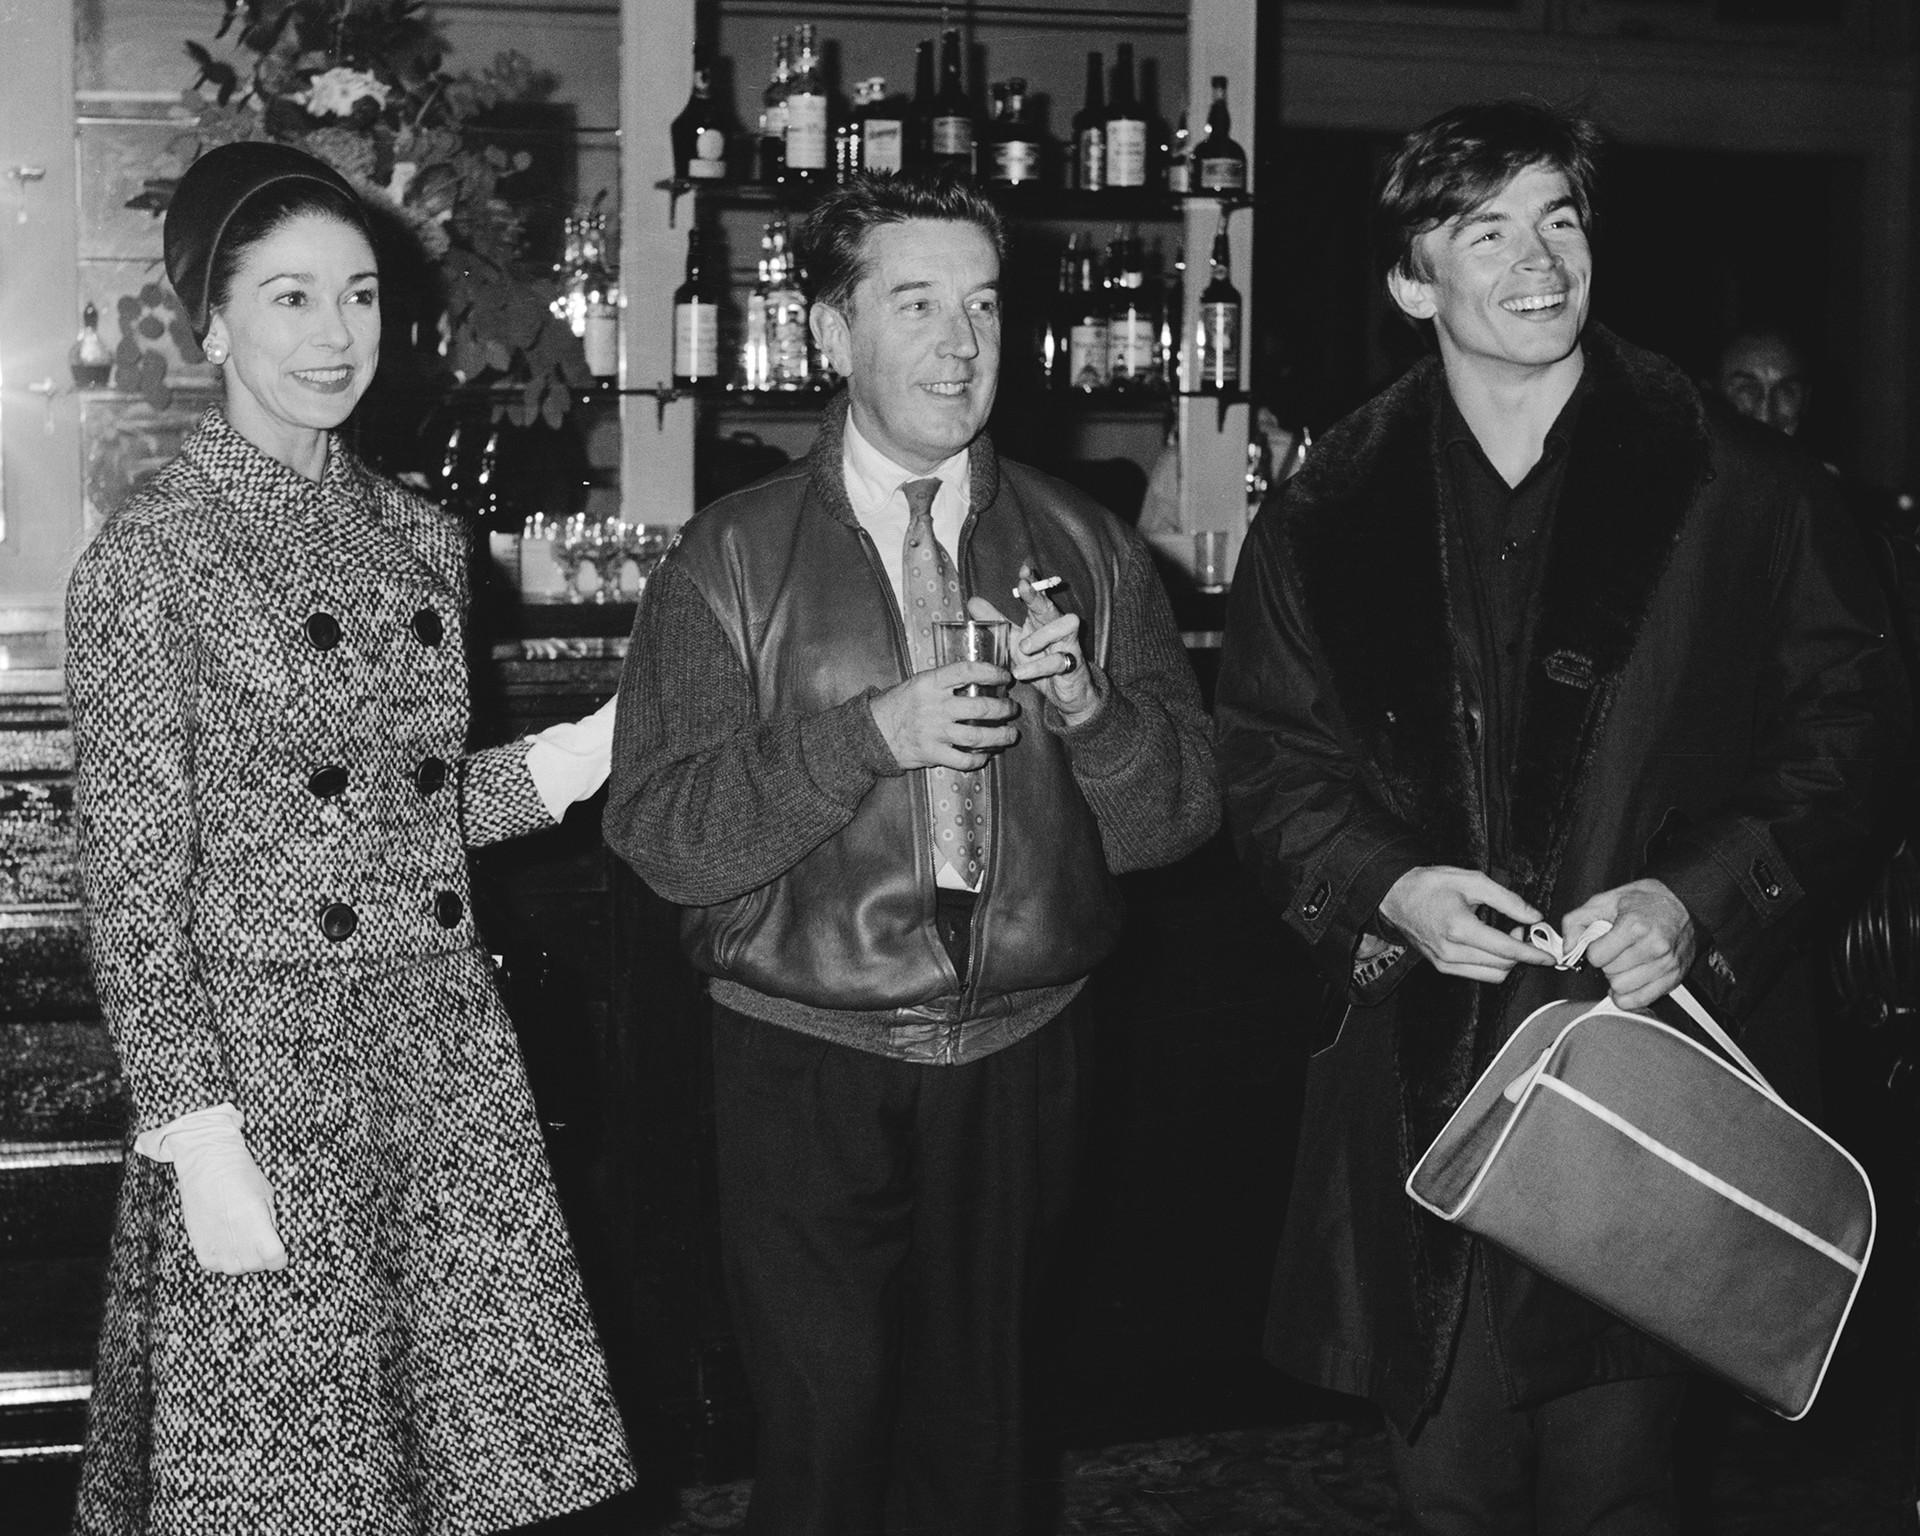 Slijeva nadesno: Plesači Margot Fonteyn, Frederick Ashton i Rudolf Nurejev u Londonu, 1961.